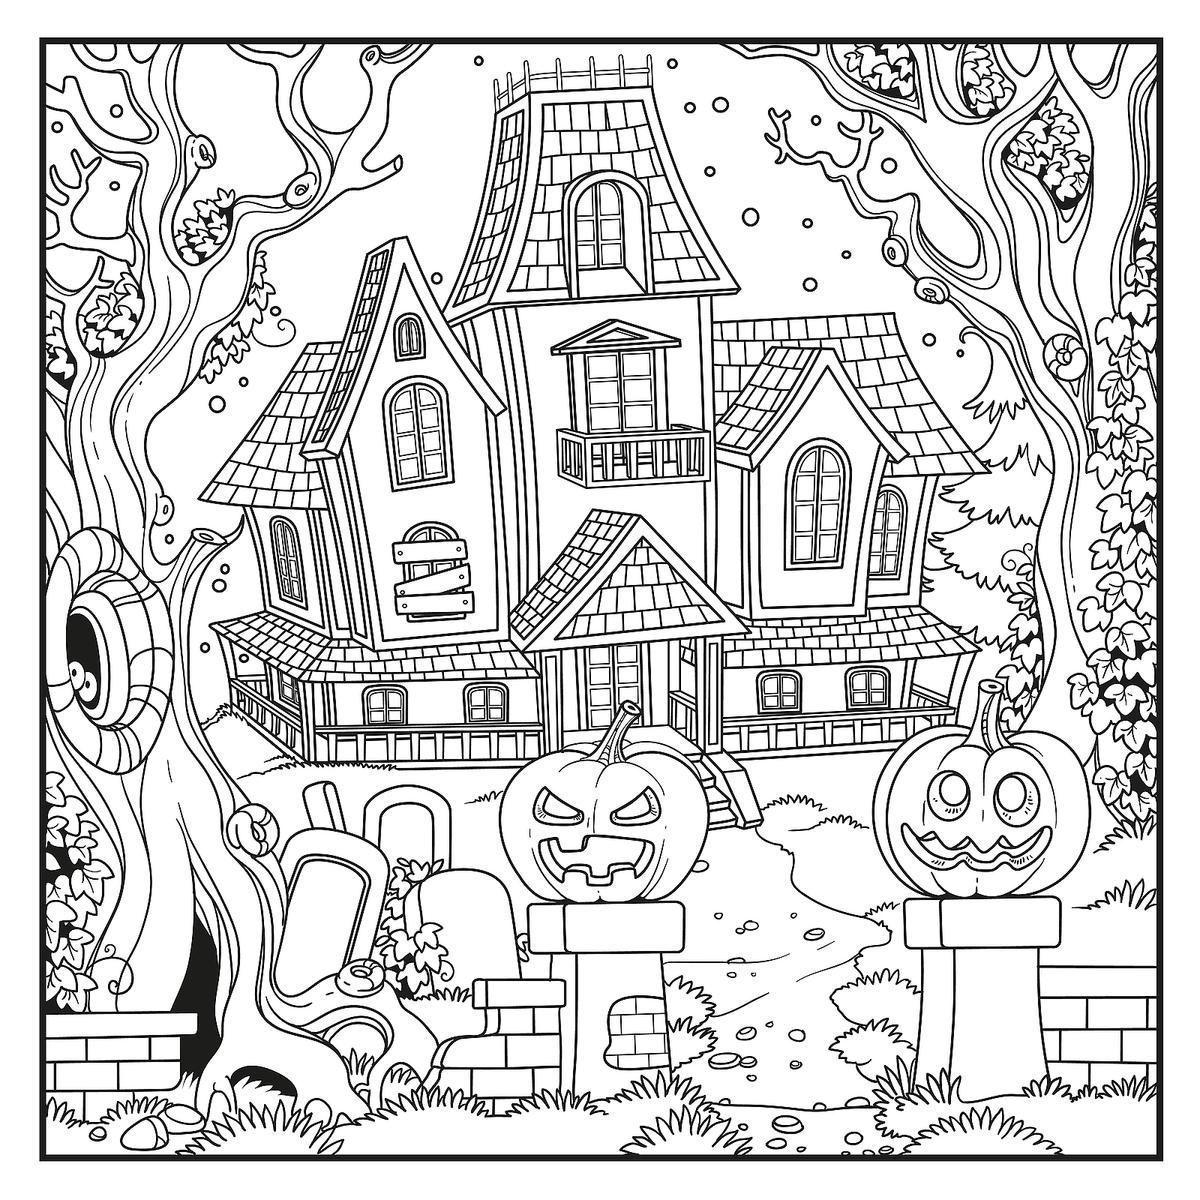 Halloween Coloring Pages Games Halloweencoloringpages Nice Halloween Coloring Pages Games Good Malvorlagen Halloween Kurbis Malvorlage Malvorlagen Fur Kinder